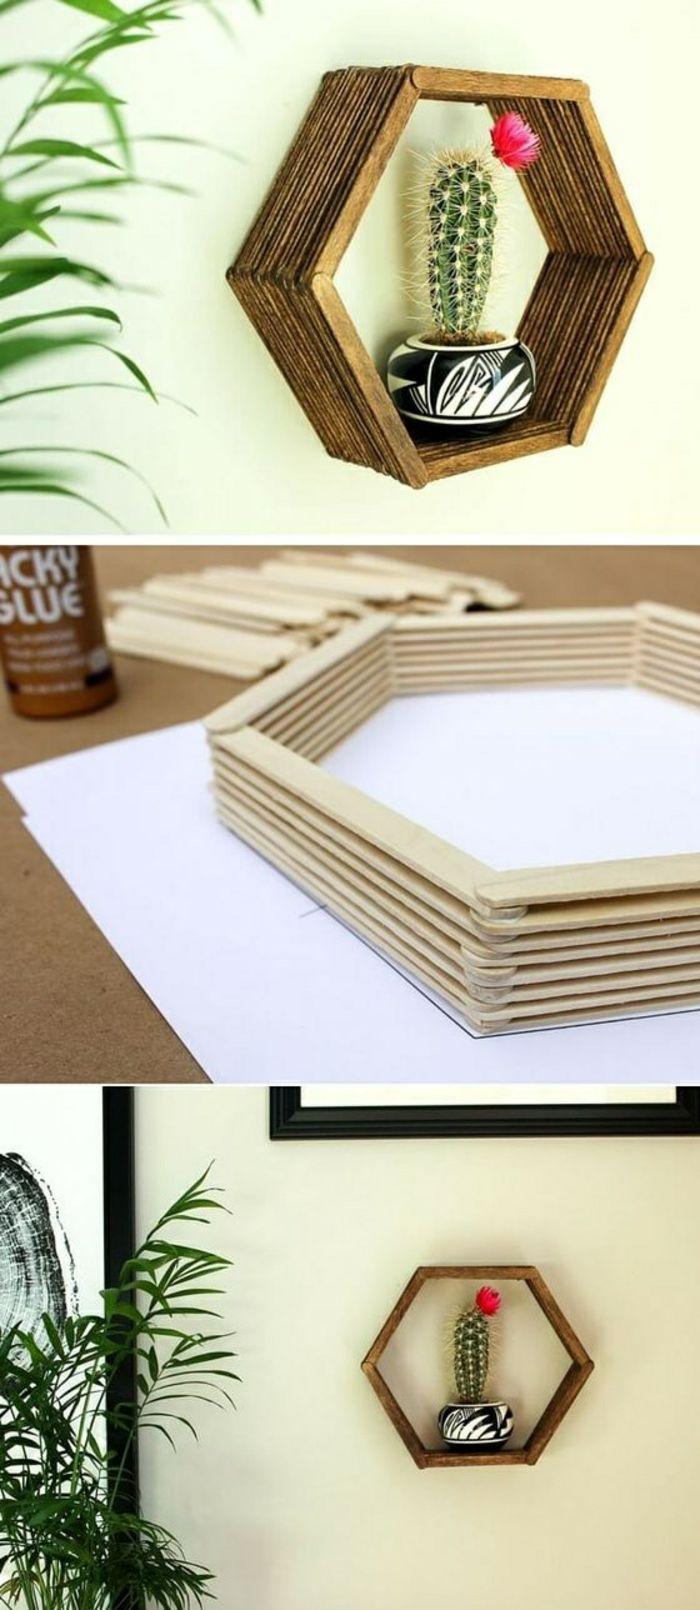 7 küchenregal selber machen aus karton blumentopf pflanze diy ...